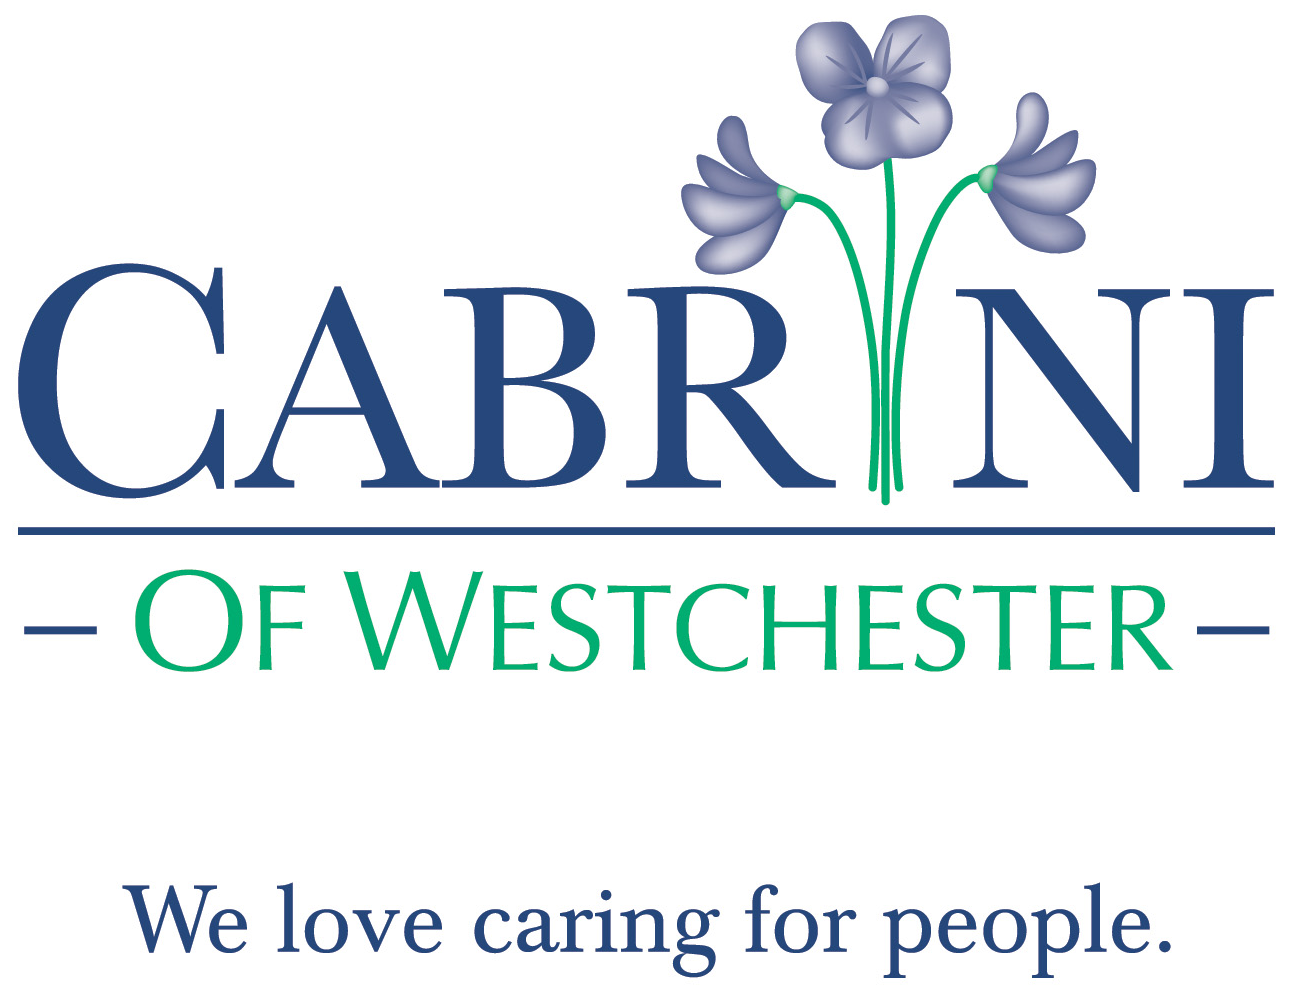 Cabrini of Westchester